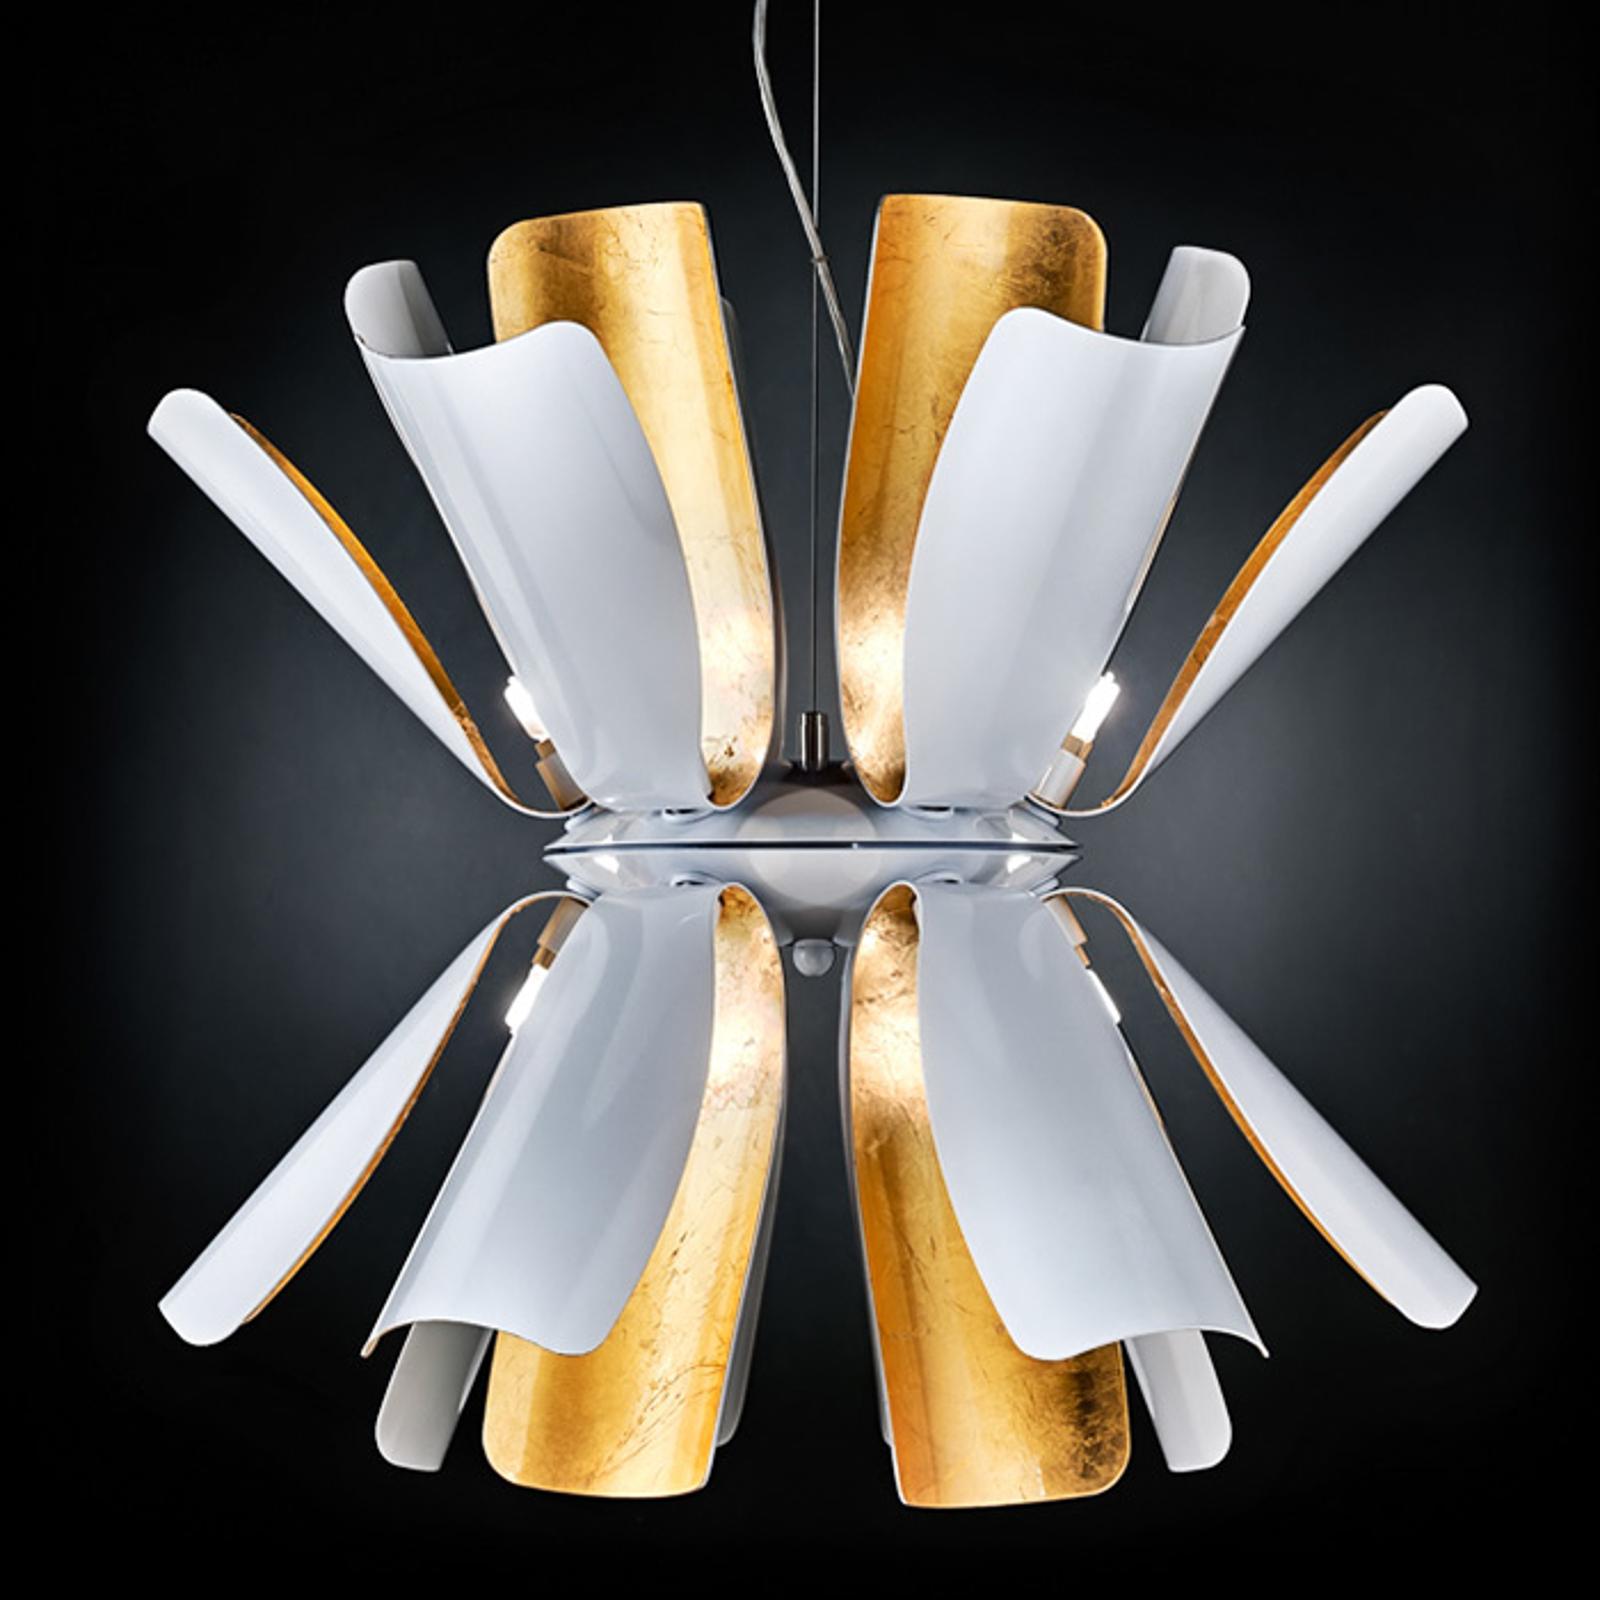 Design-hanglamp Tropic met bladgoud